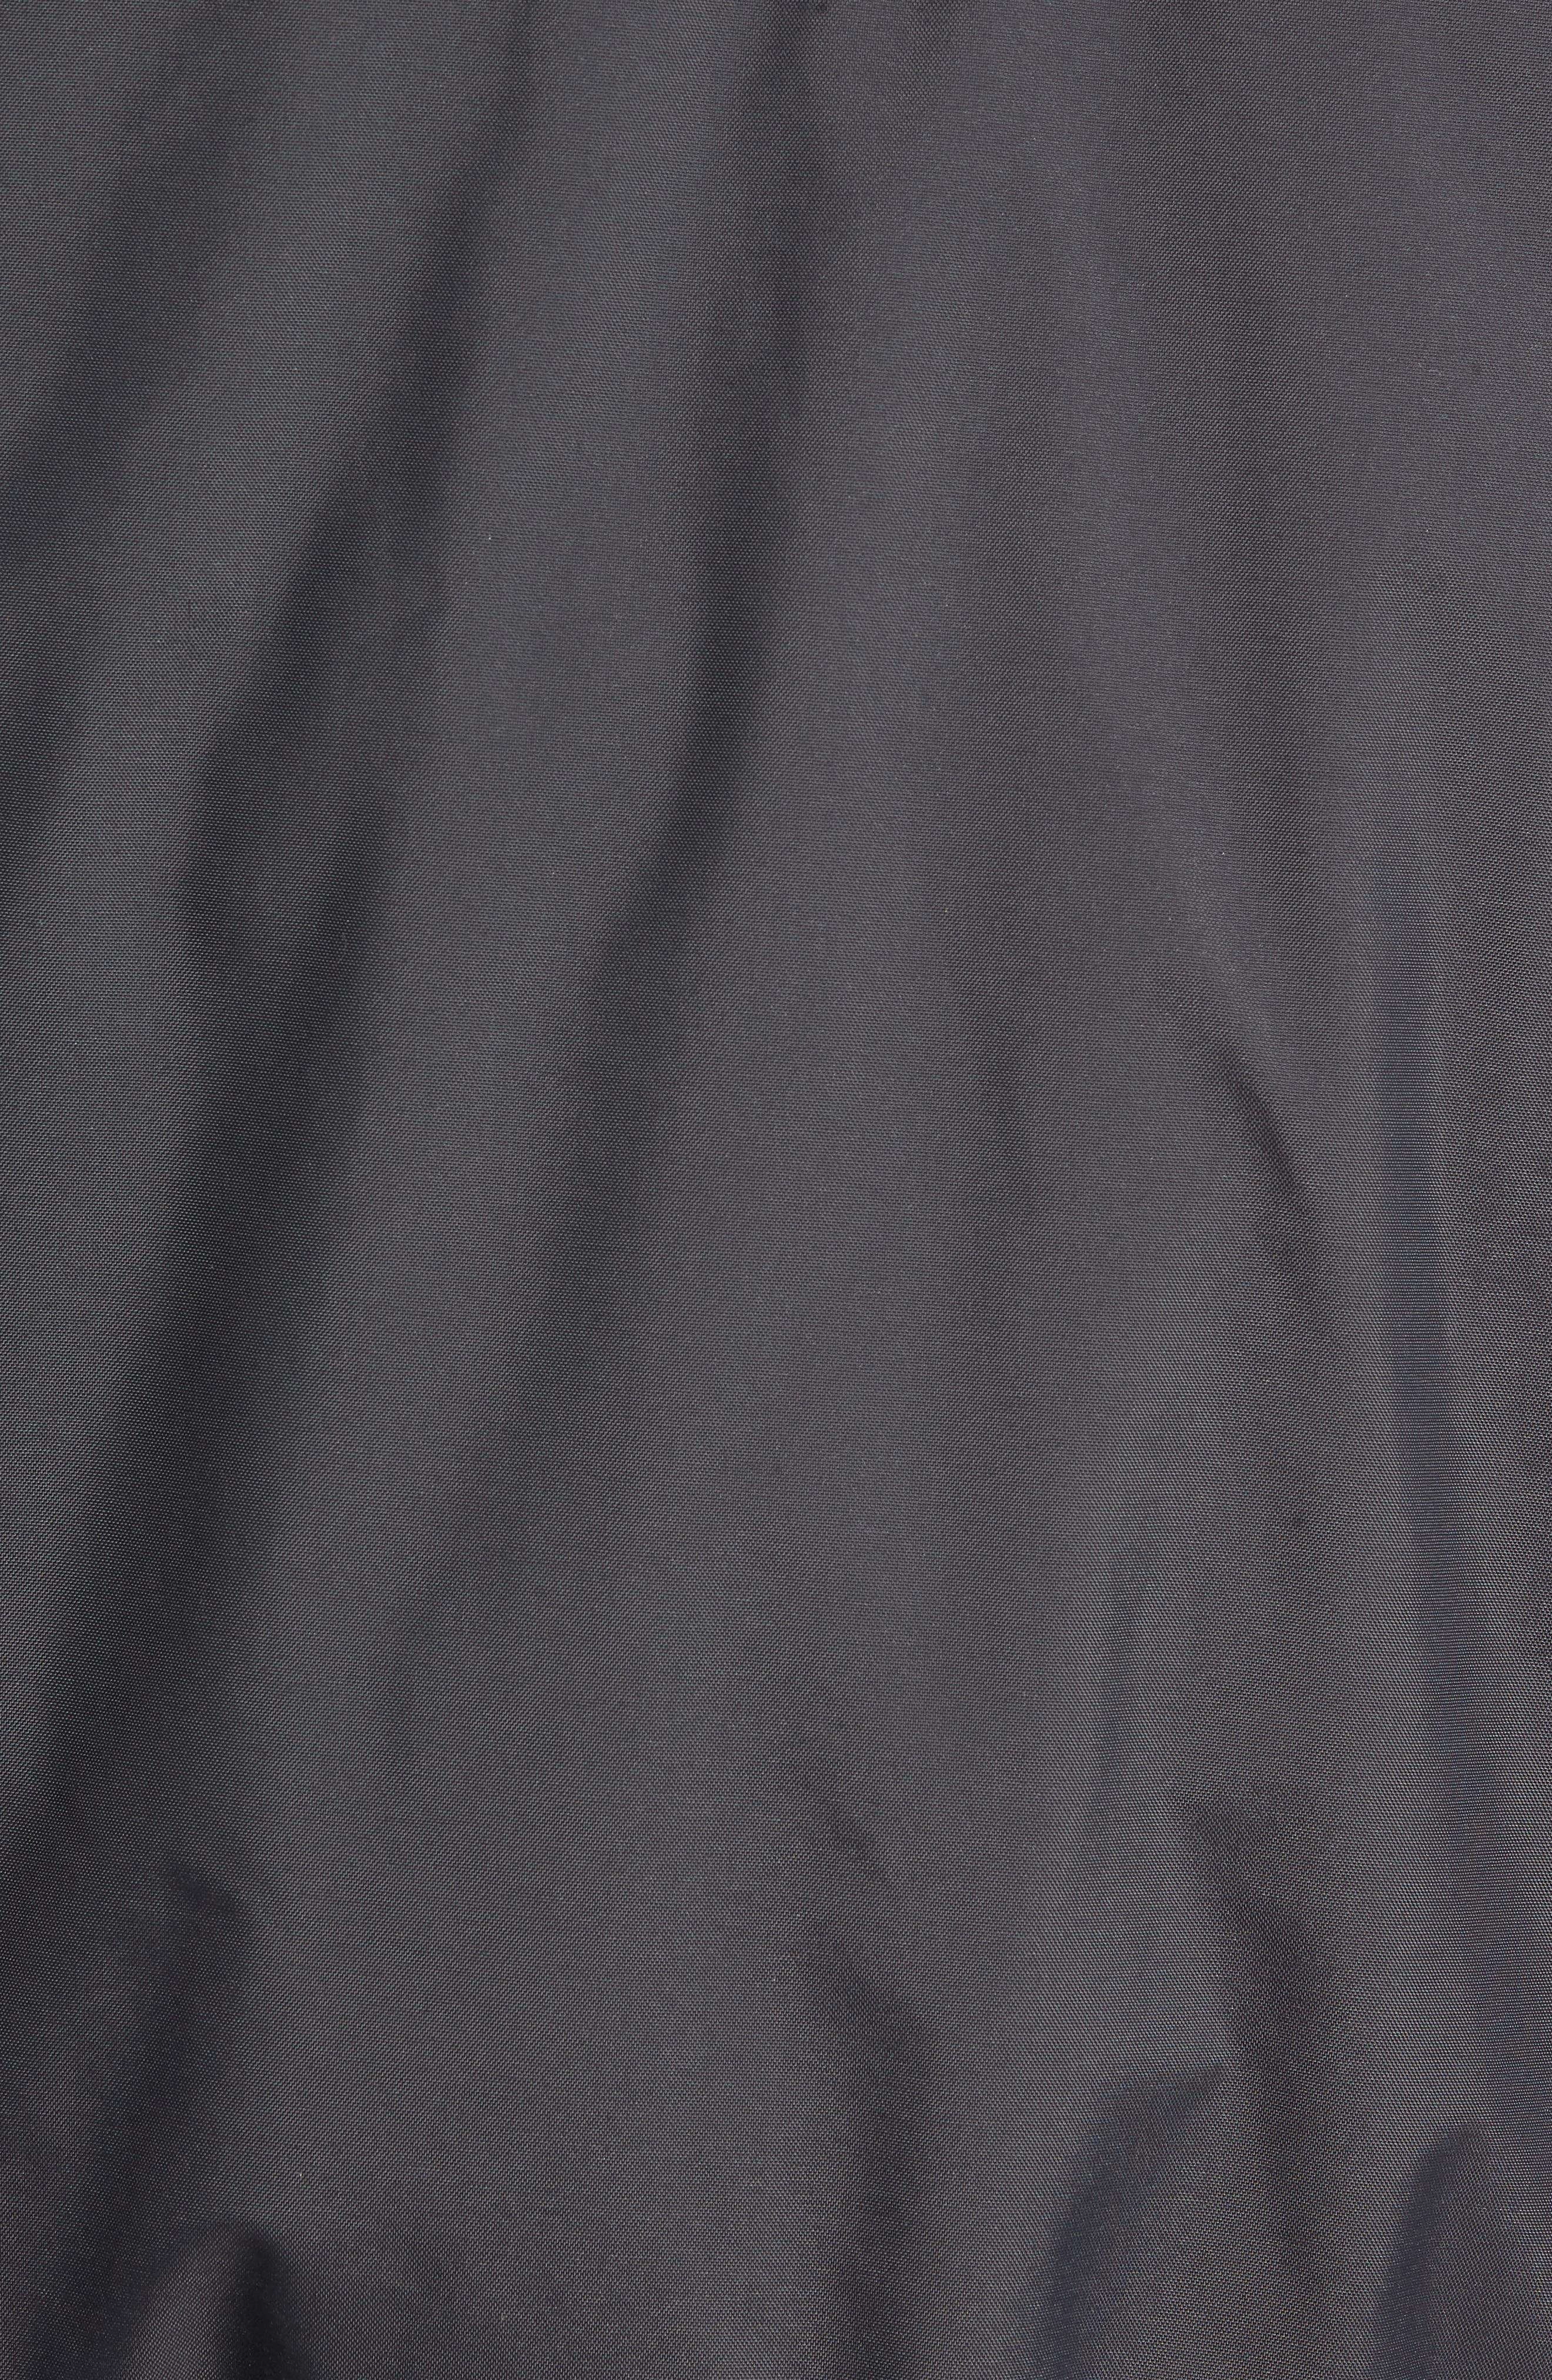 Gotham III Waterproof Down Jacket,                             Alternate thumbnail 7, color,                             ASPHALT GREY/ TNF BLACK